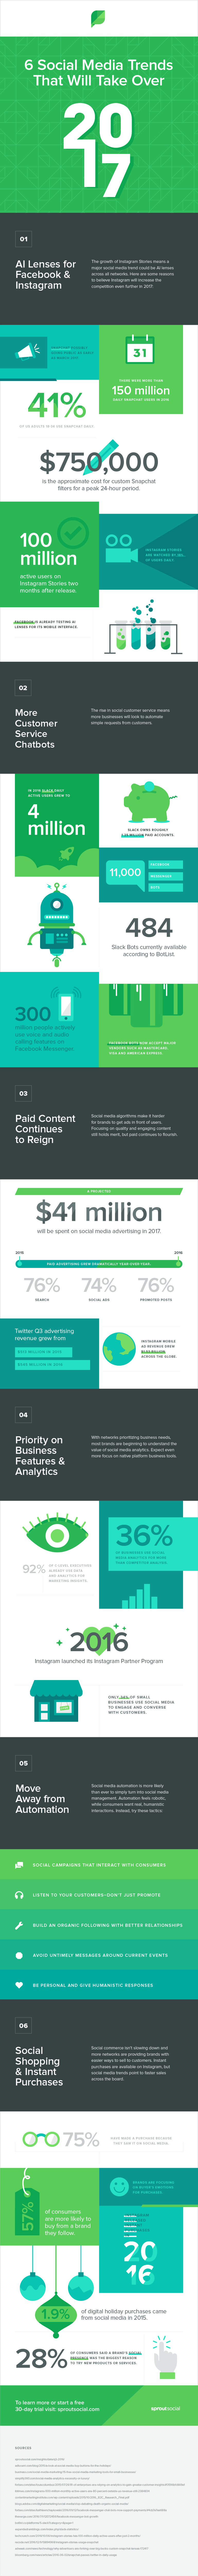 6 trends på de sociale medier i 2017